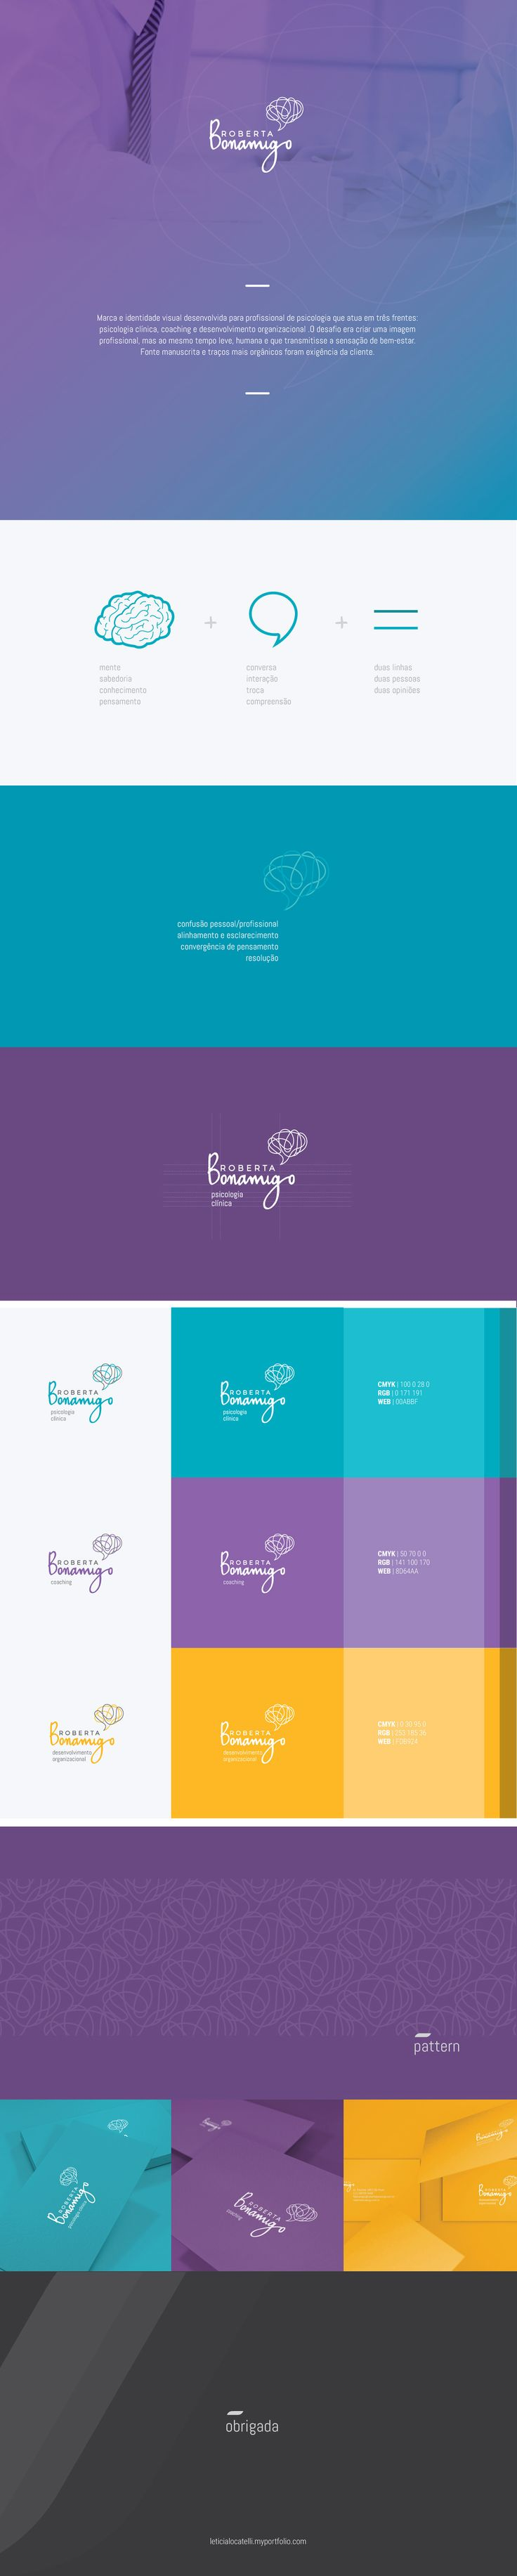 branding Roberta Bonamigo • Psicóloga Coaching on Behance